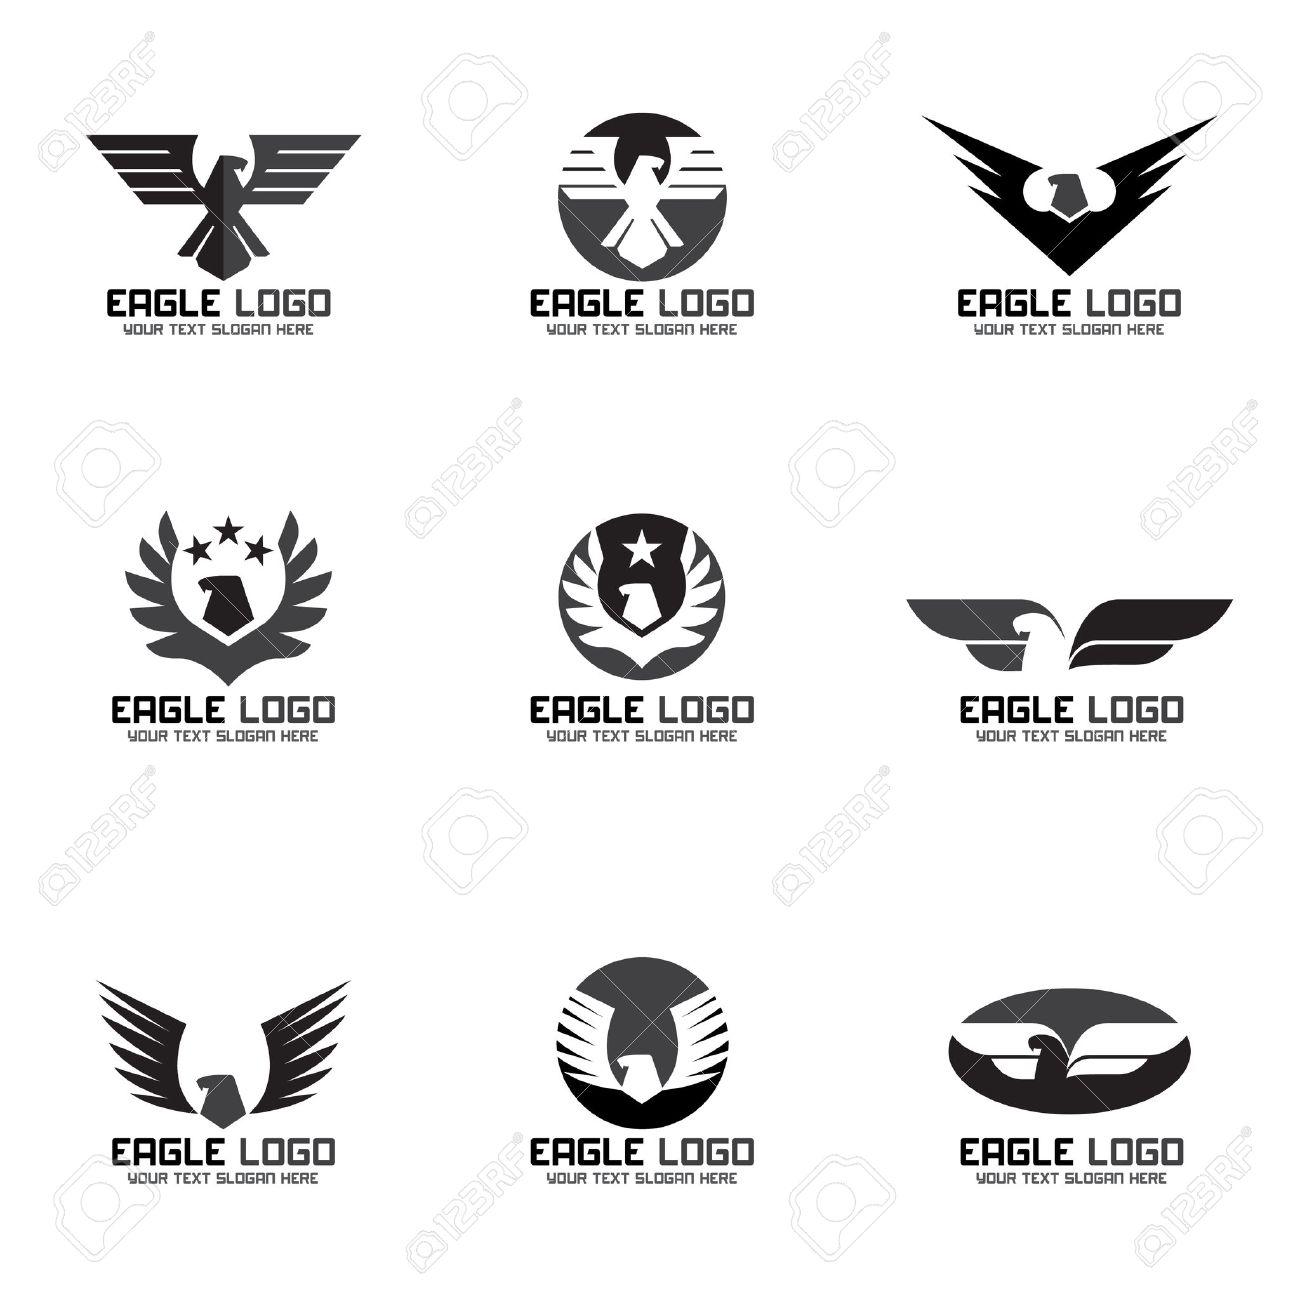 black gray eagle vector logo set design royalty free cliparts rh 123rf com logo vectors psd logo vectors for photoshop